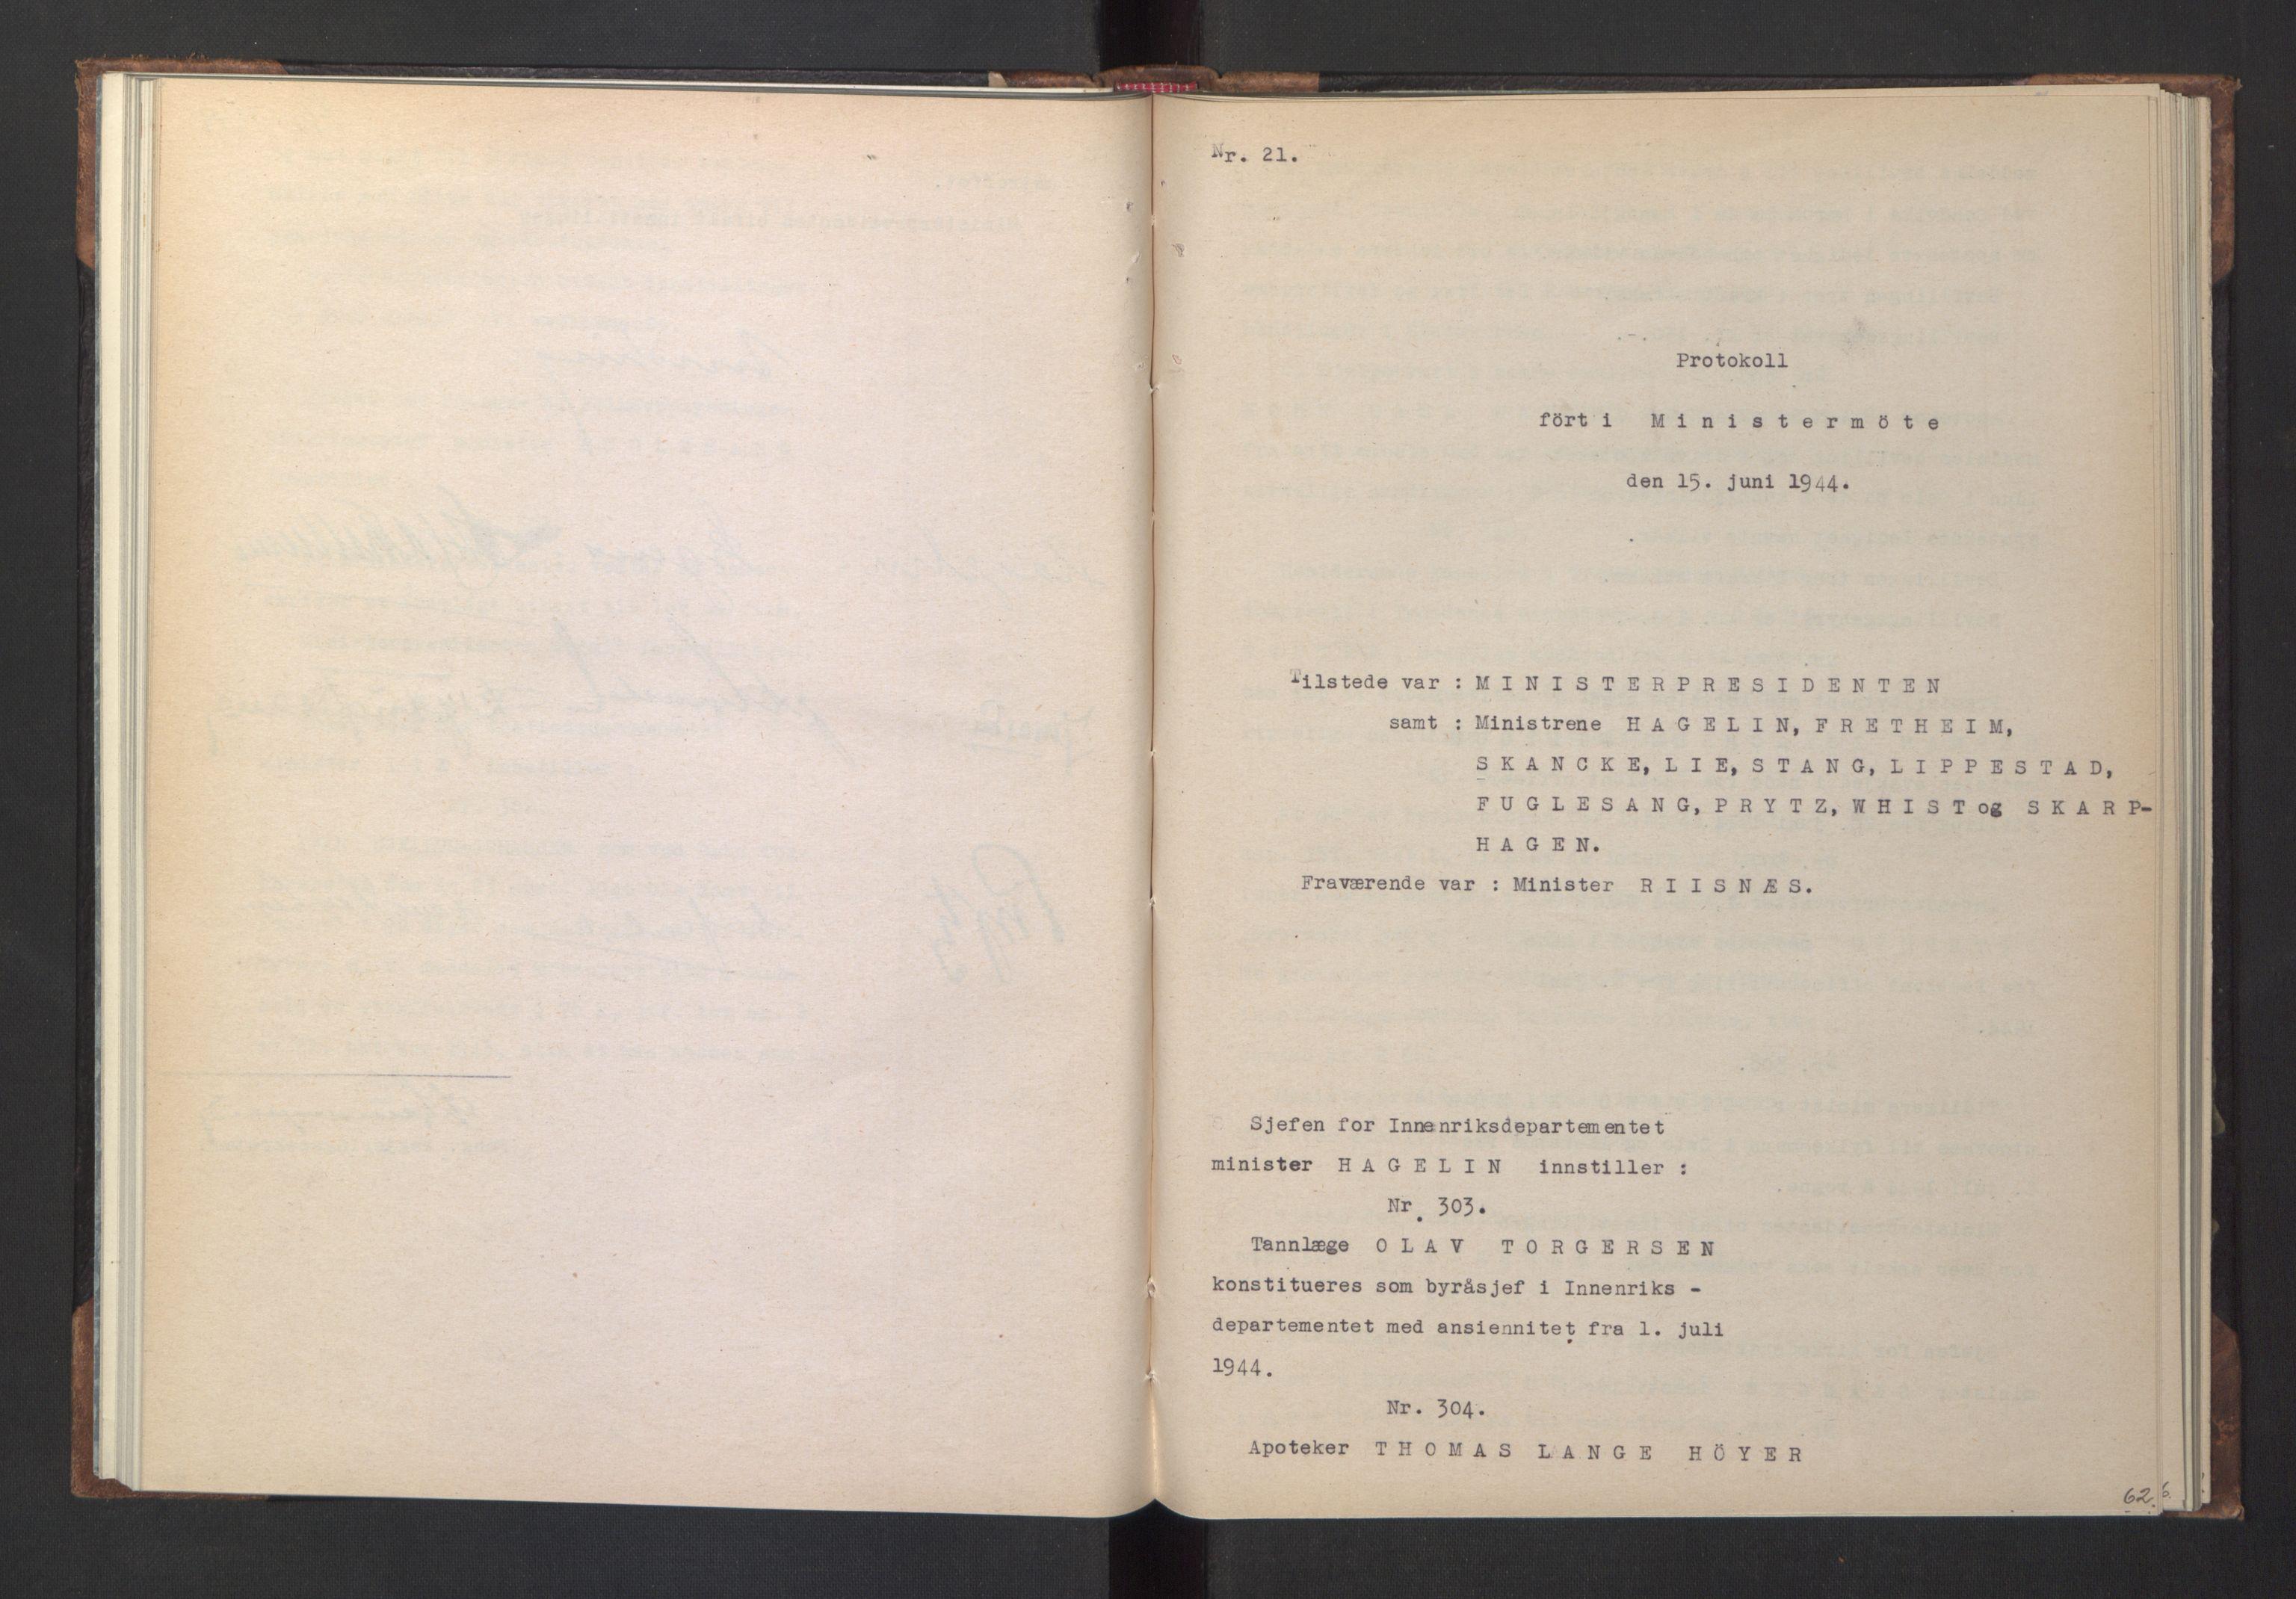 RA, NS-administrasjonen 1940-1945 (Statsrådsekretariatet, de kommisariske statsråder mm), D/Da/L0005: Protokoll fra ministermøter, 1944, s. 61b-62a